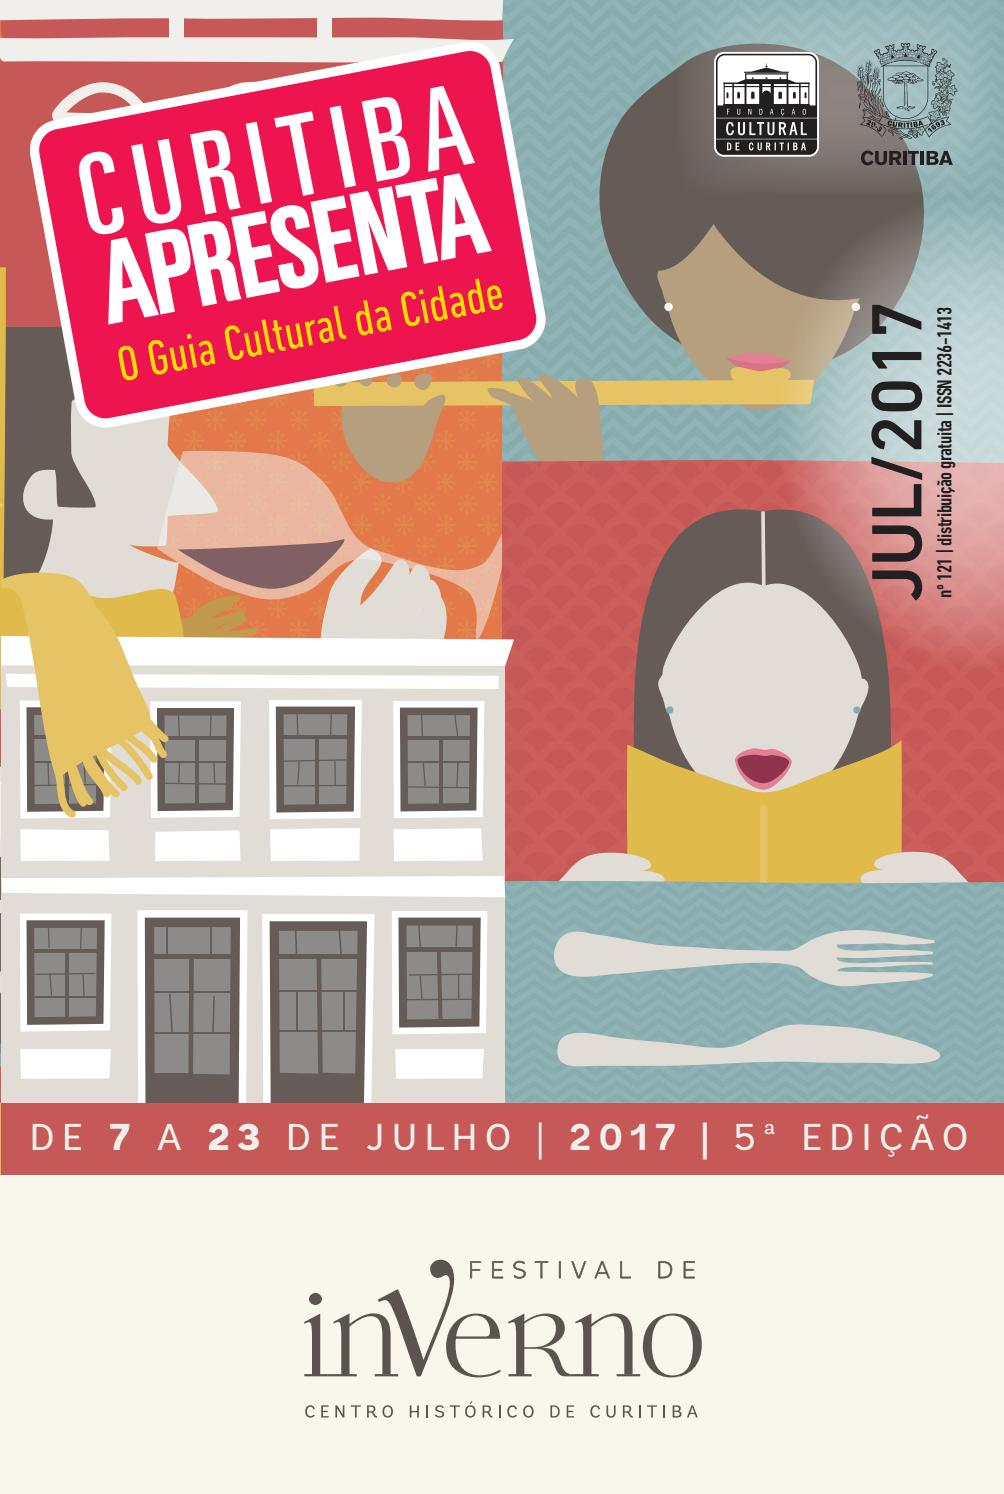 121 - Guia Curitiba Apresenta - Julho 2017 by Guia Curitiba Apresenta -  issuu 70e0768fea